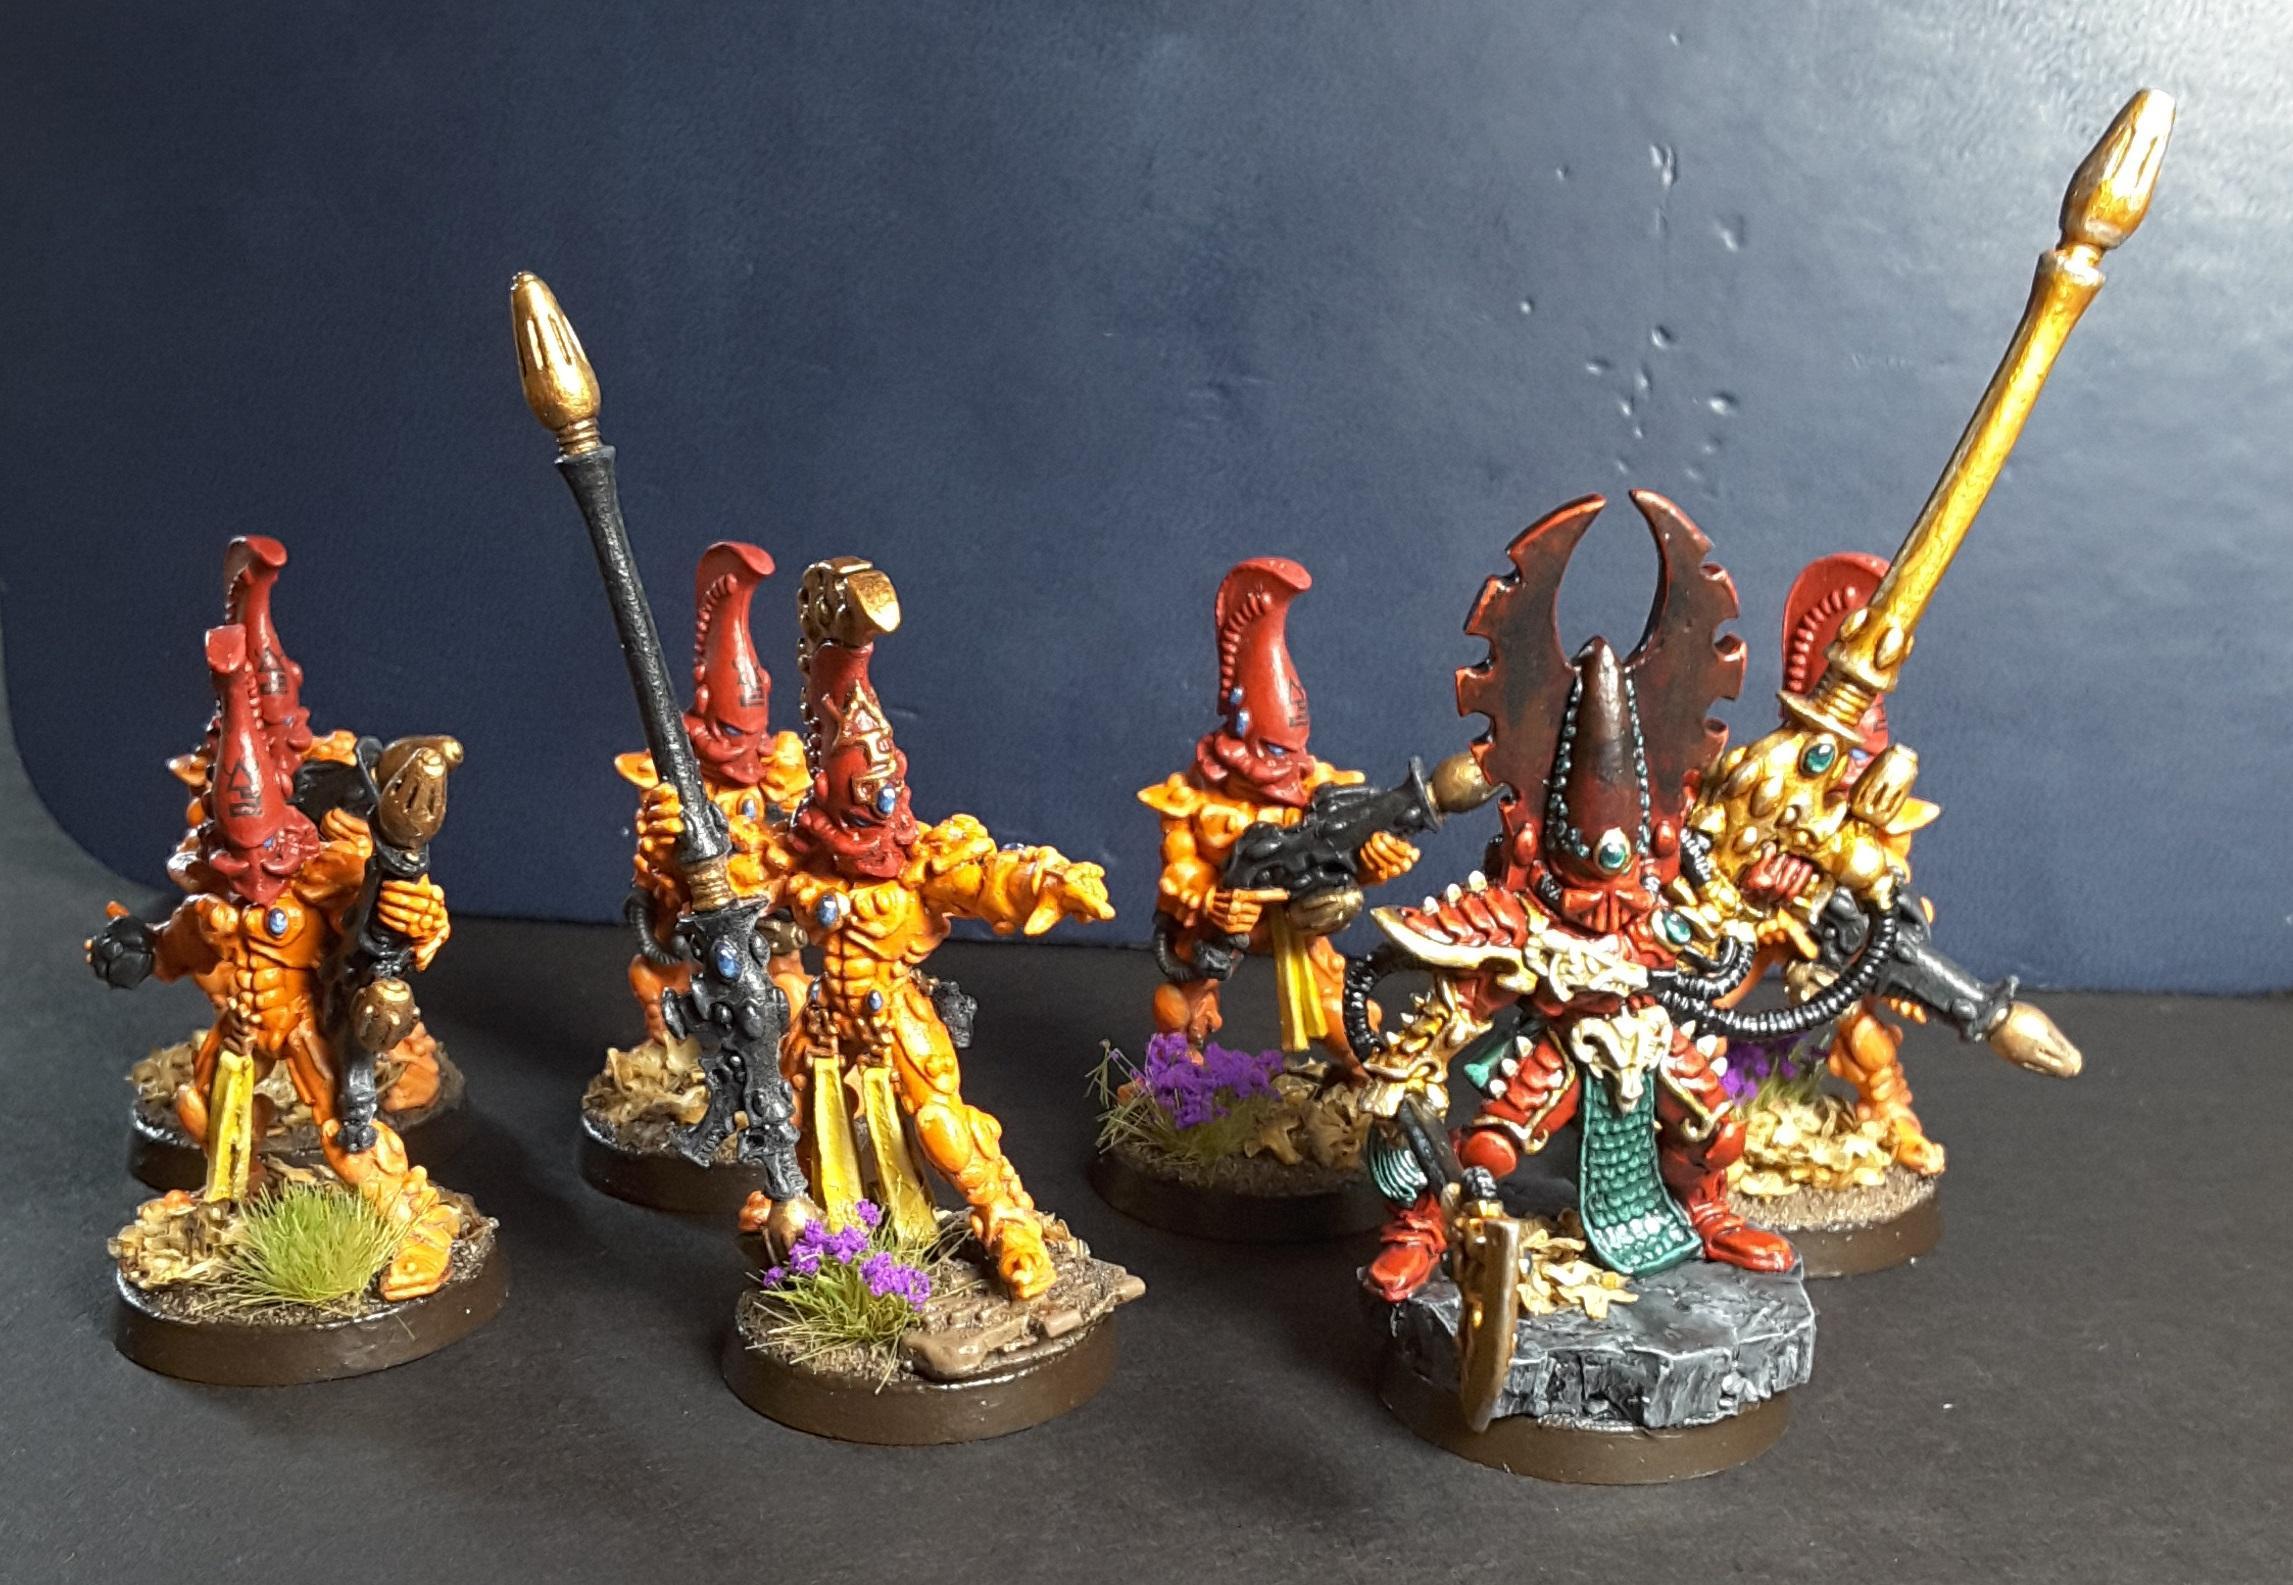 Aspect Warrior, Eldar, Fire Dragon, Fuegan